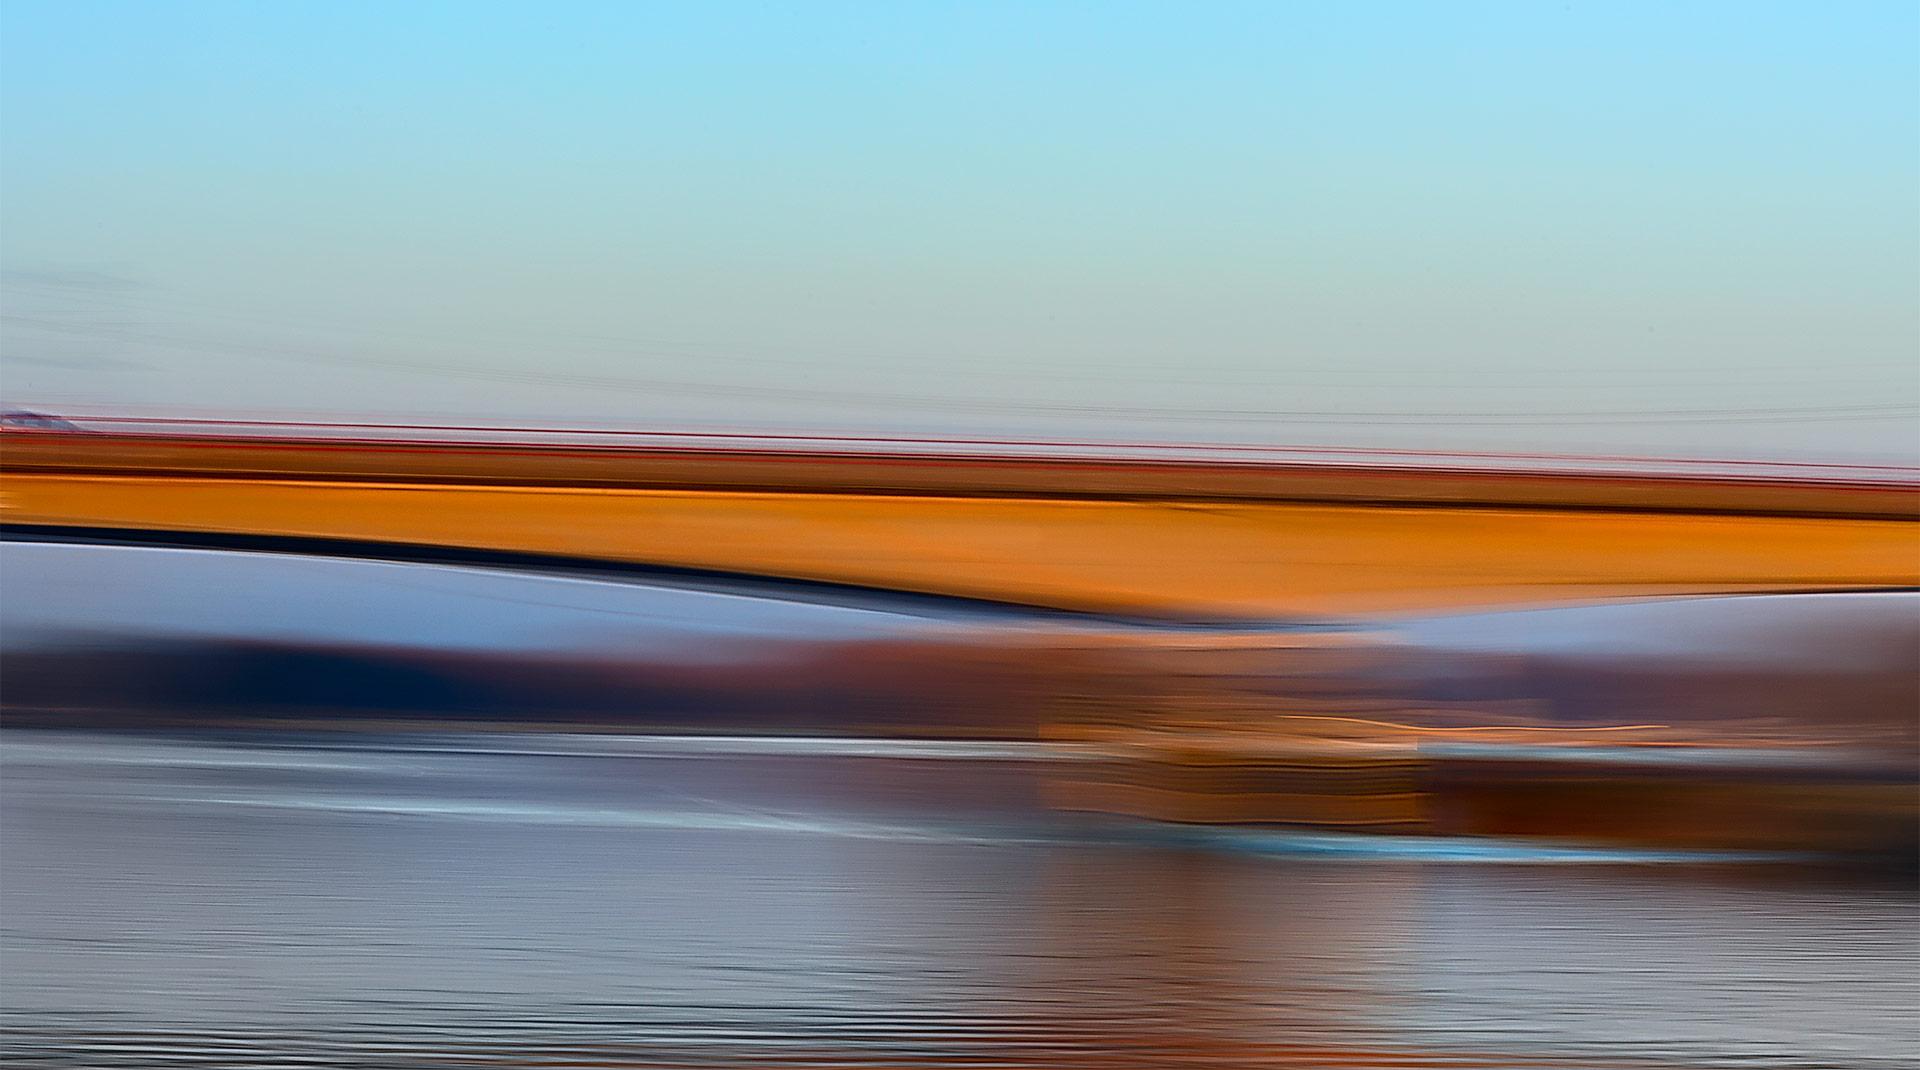 Bridge at Panheel, Holland.